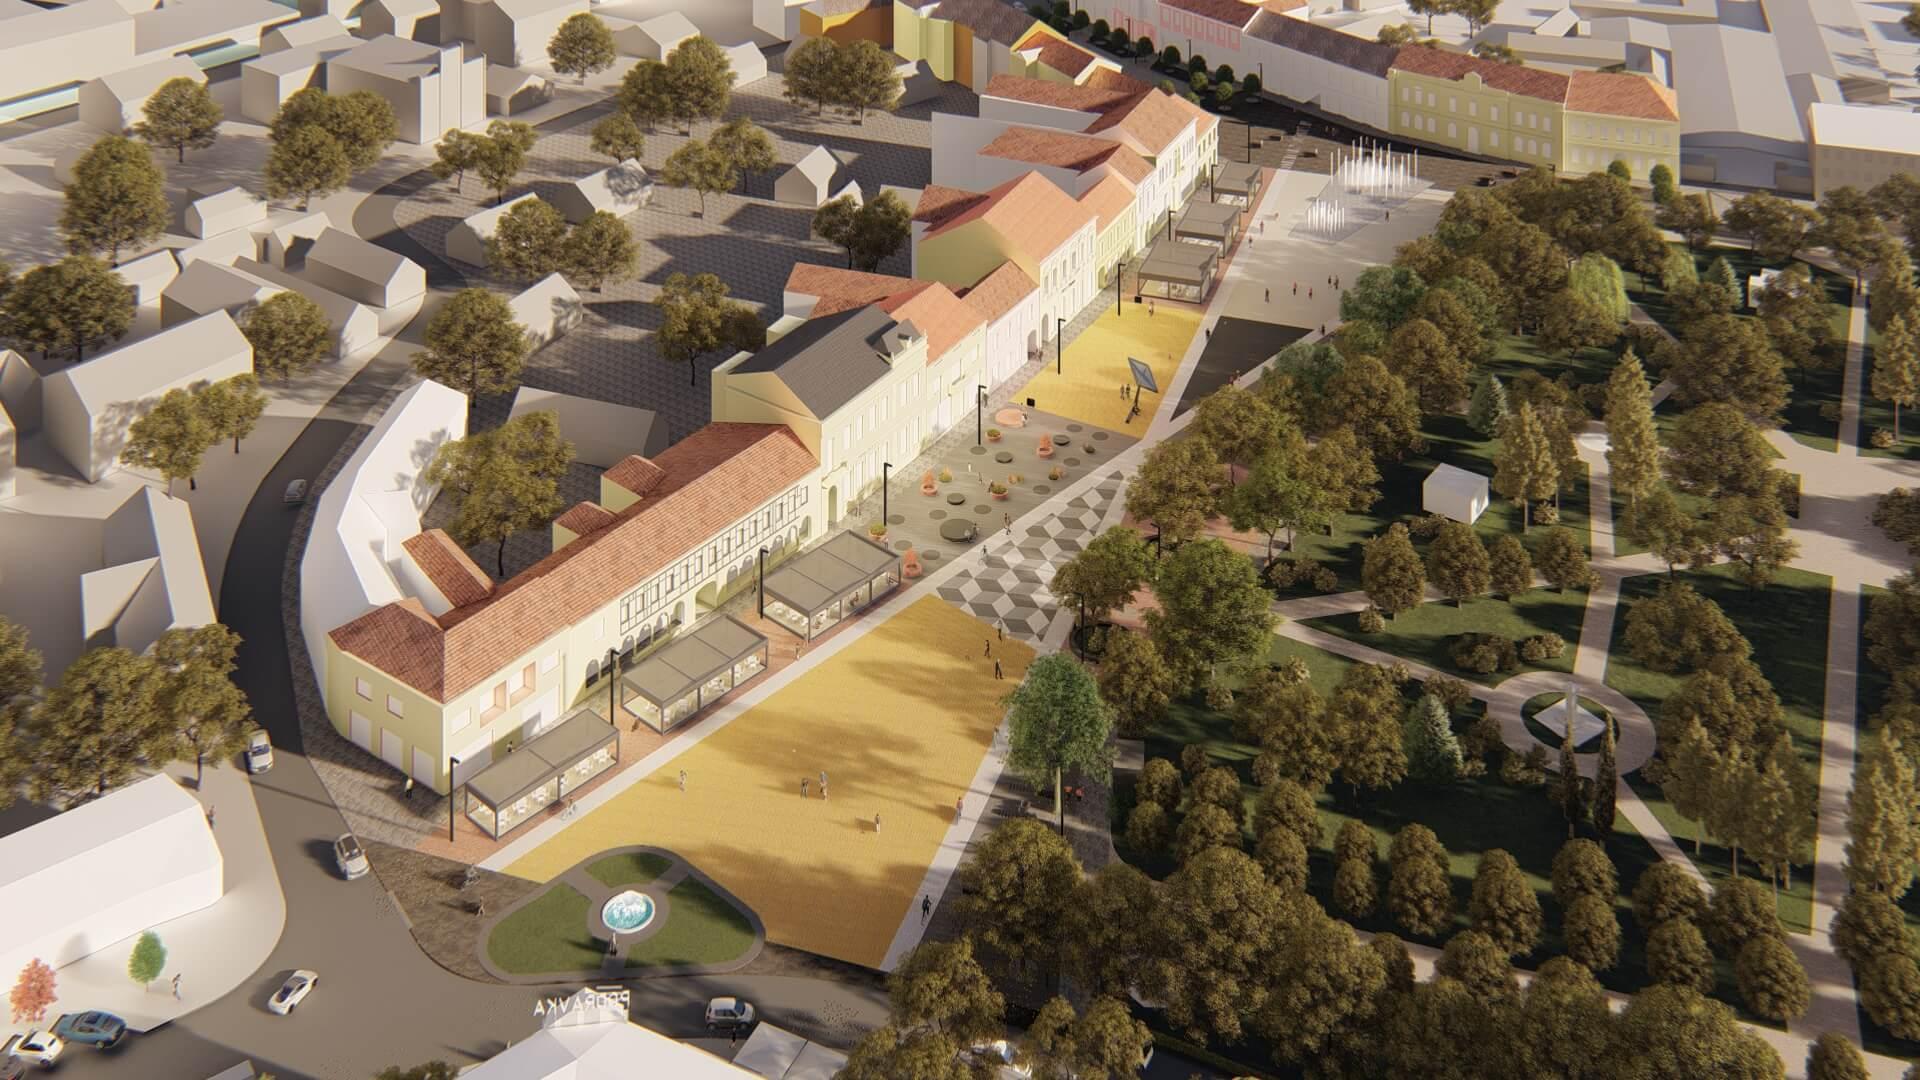 Obnova središta Koprivnice